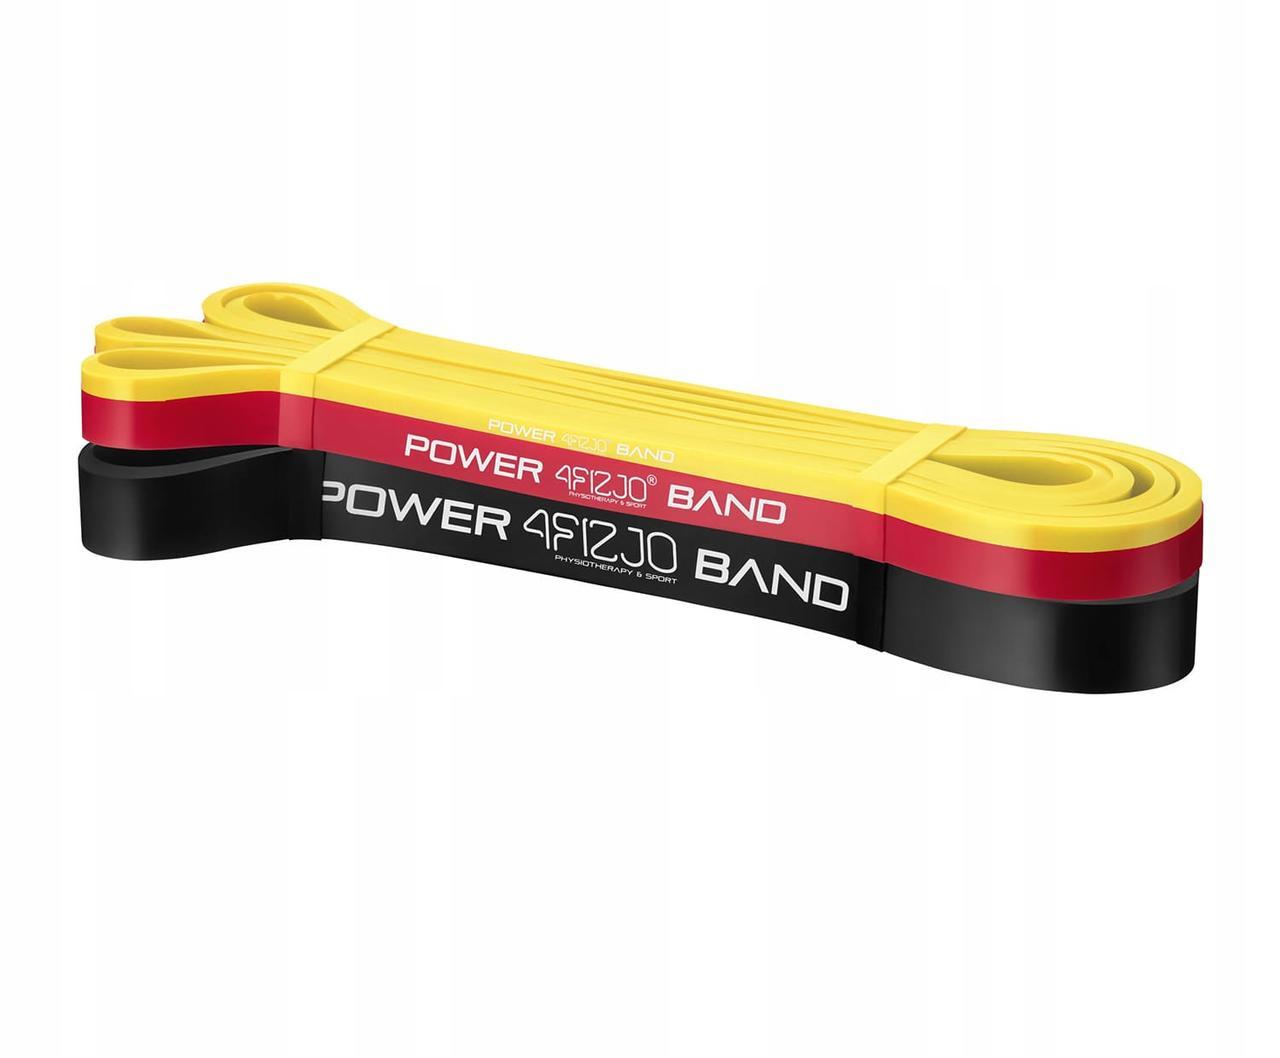 Еспандер-петля (гумка для фітнесу і спорту) 4FIZJO Power Band 3 шт 2-17 кг 4FJ0062